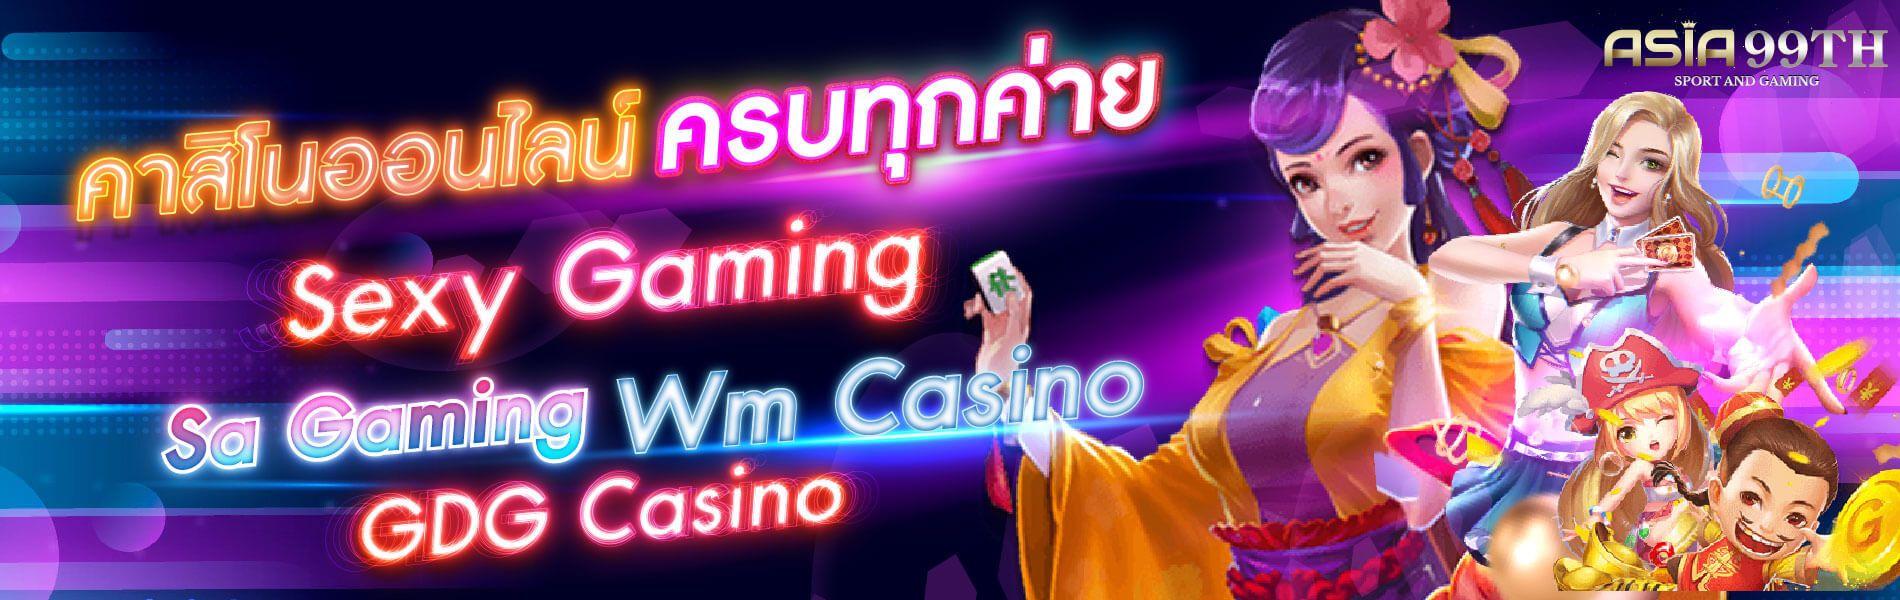 58c5db339332b075e1162fd27fa785d2.คาสิโนออนไลน์-ครบทุกค่าย-Sexy-Gaming-Sa-Gaming-Wm-Casino-GDG-Casino